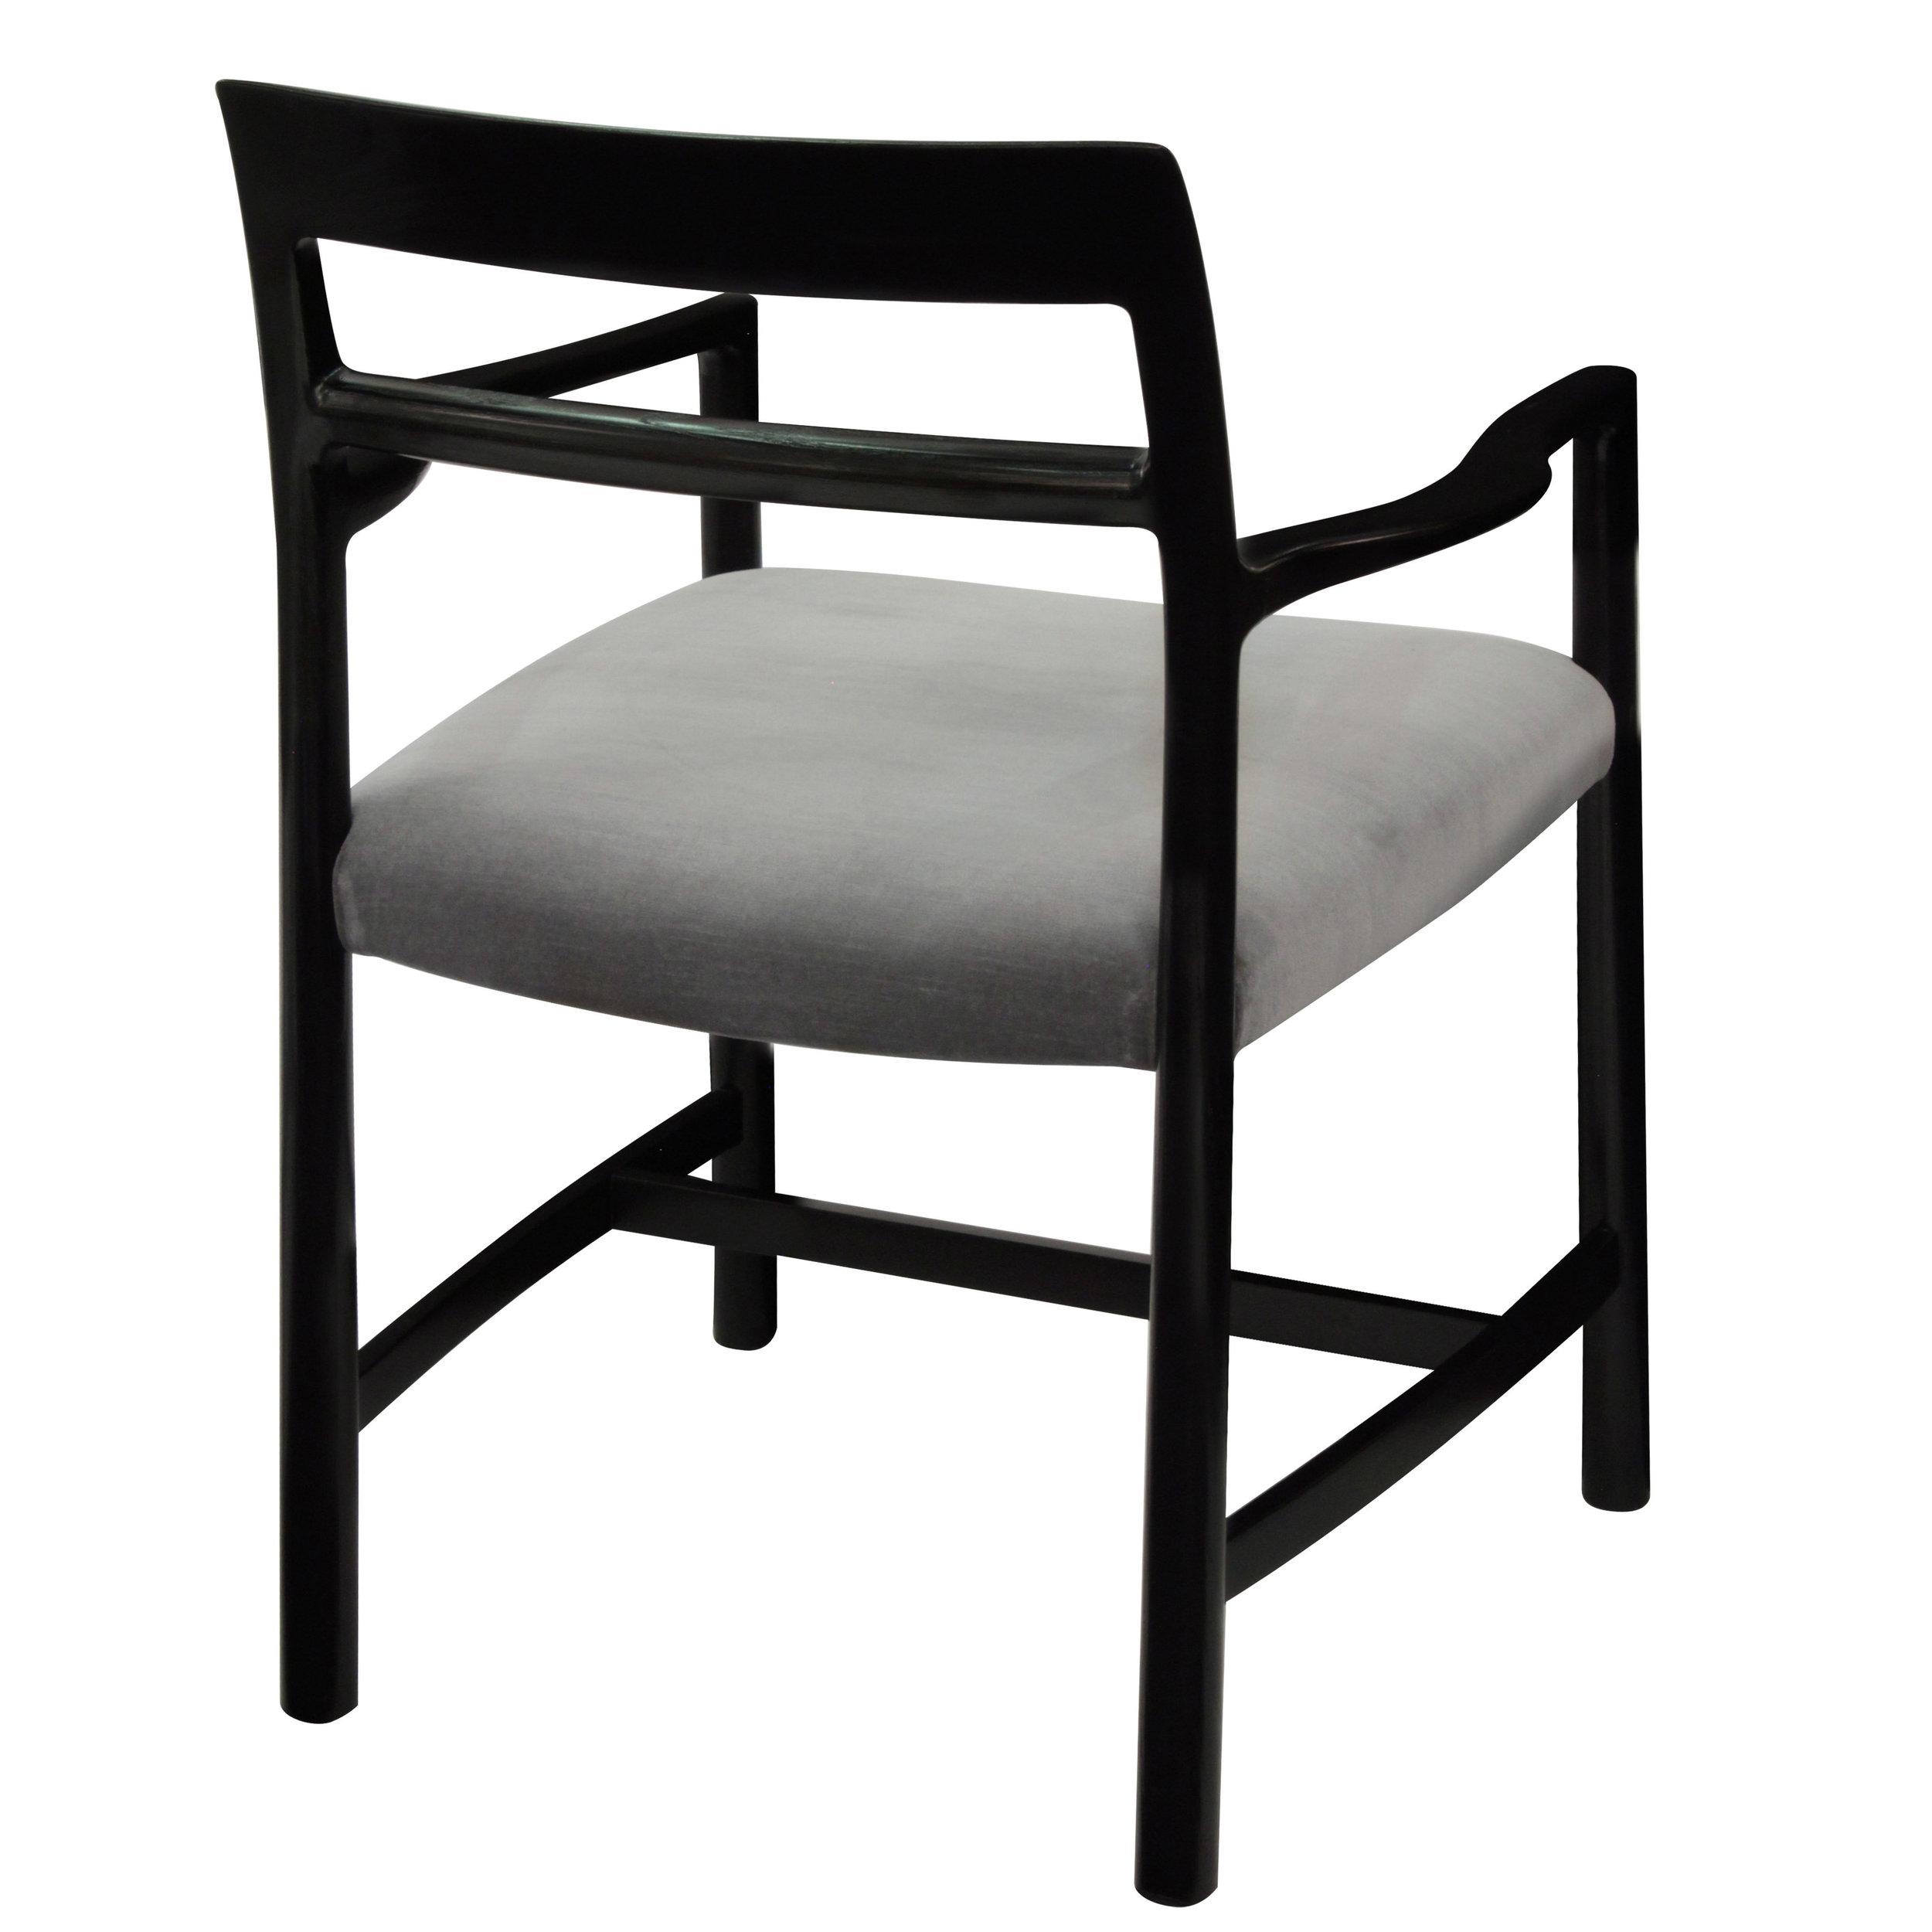 Dunbar 150 setof8 drk ash diningchairs151 detail1 hires.jpg